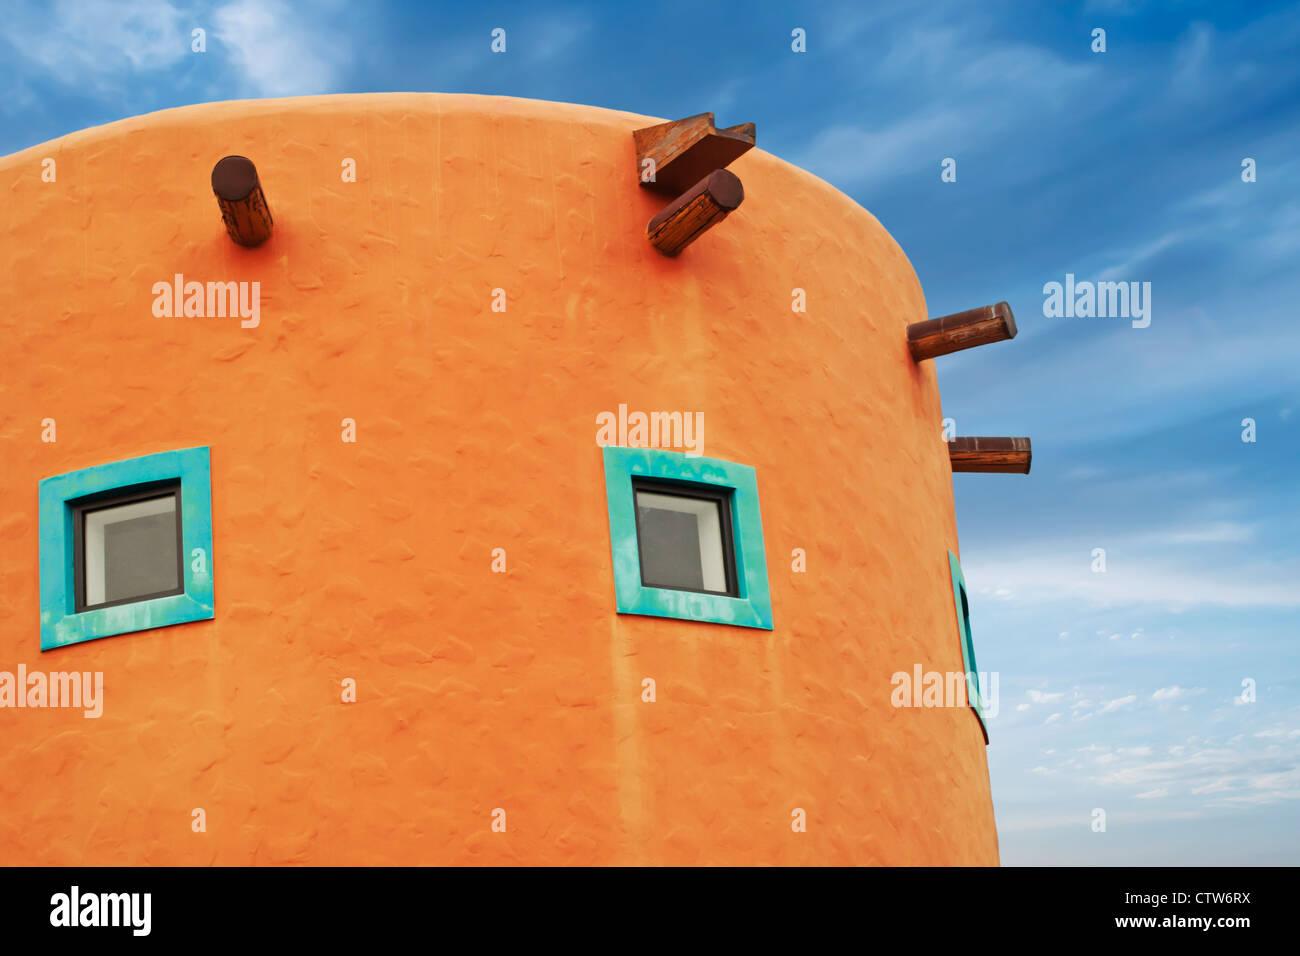 style building detail in vibrant orange